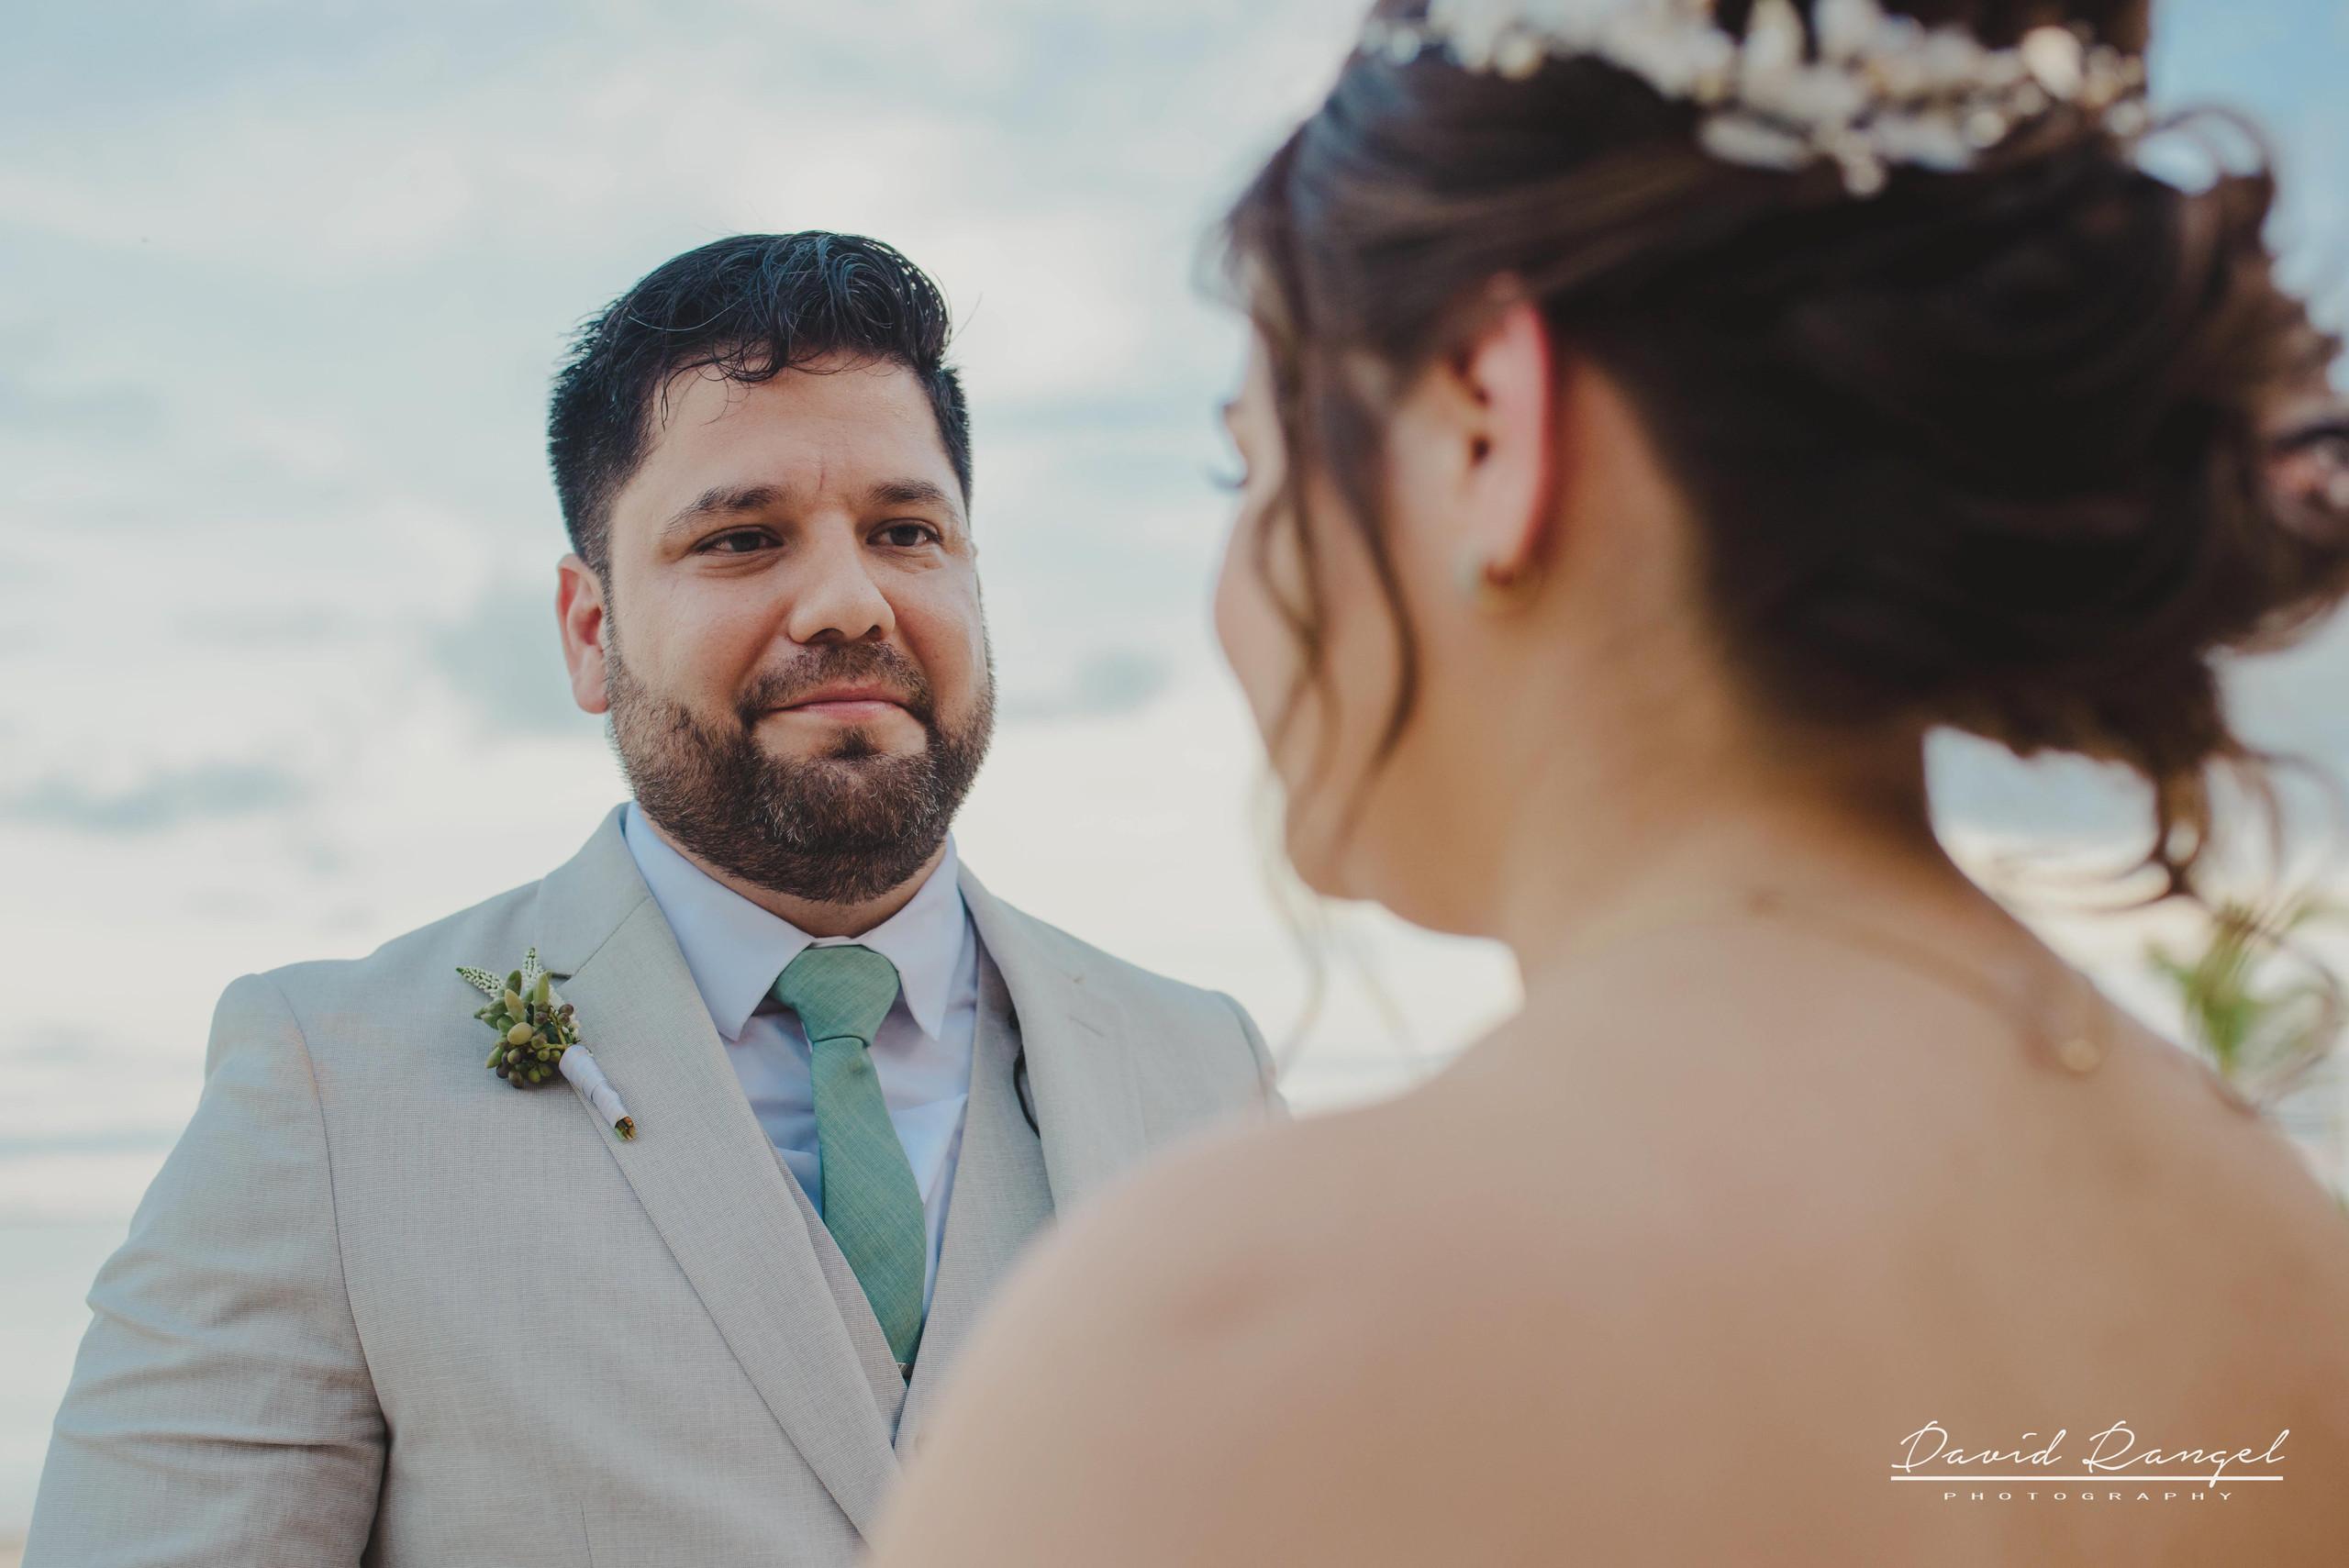 groom+bride+wedding+ceremony+dress+villa+chenera+isla+blanca+costa+mujeres+garden+beach+chaman+traditional+mayan+wedding+eyes+conection